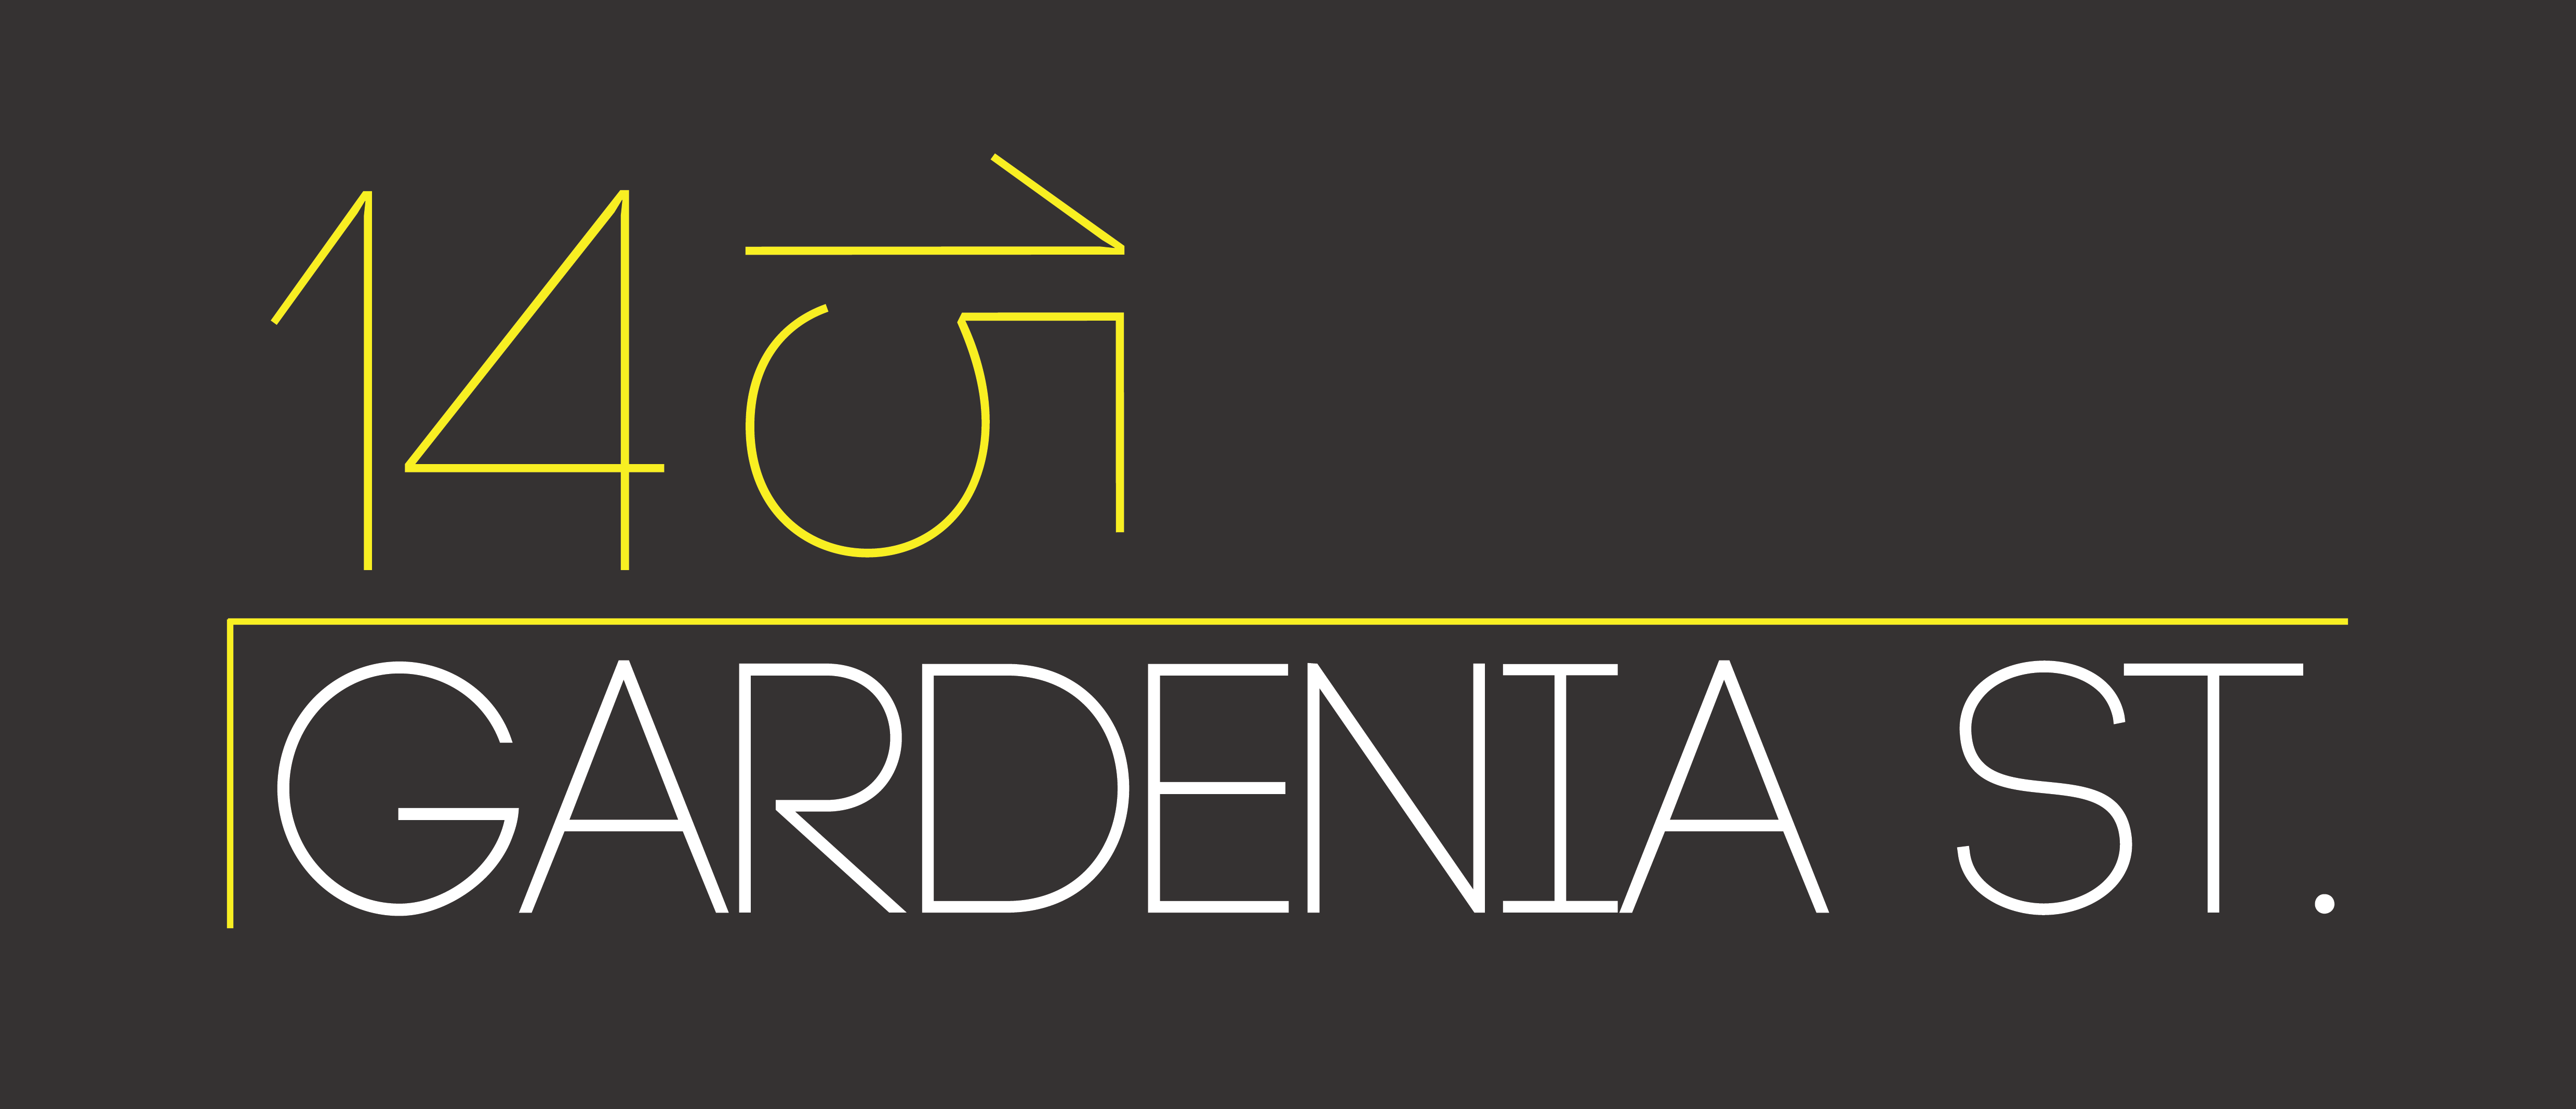 1415 Gardenia St Logo.png